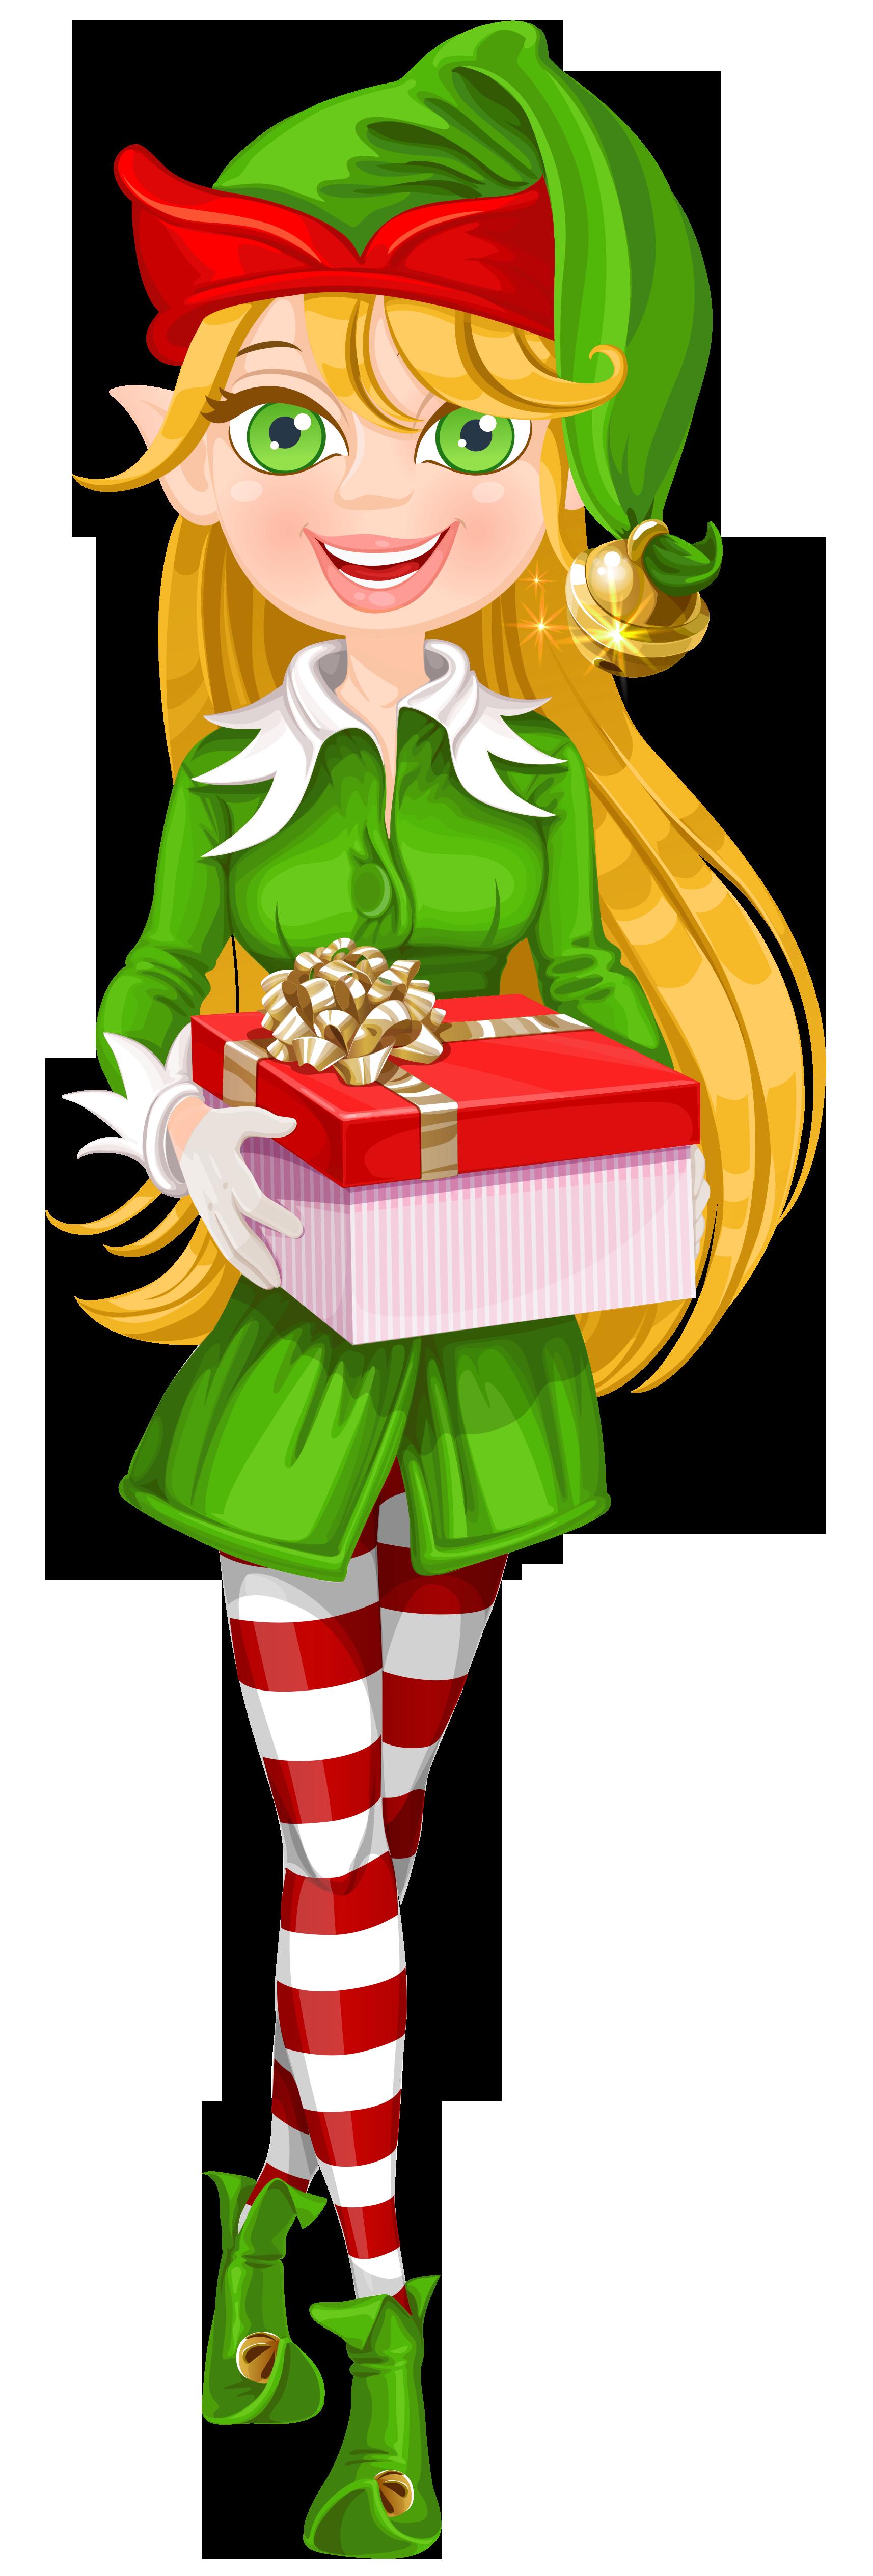 Elf png images elves. Santa clipart sleeping